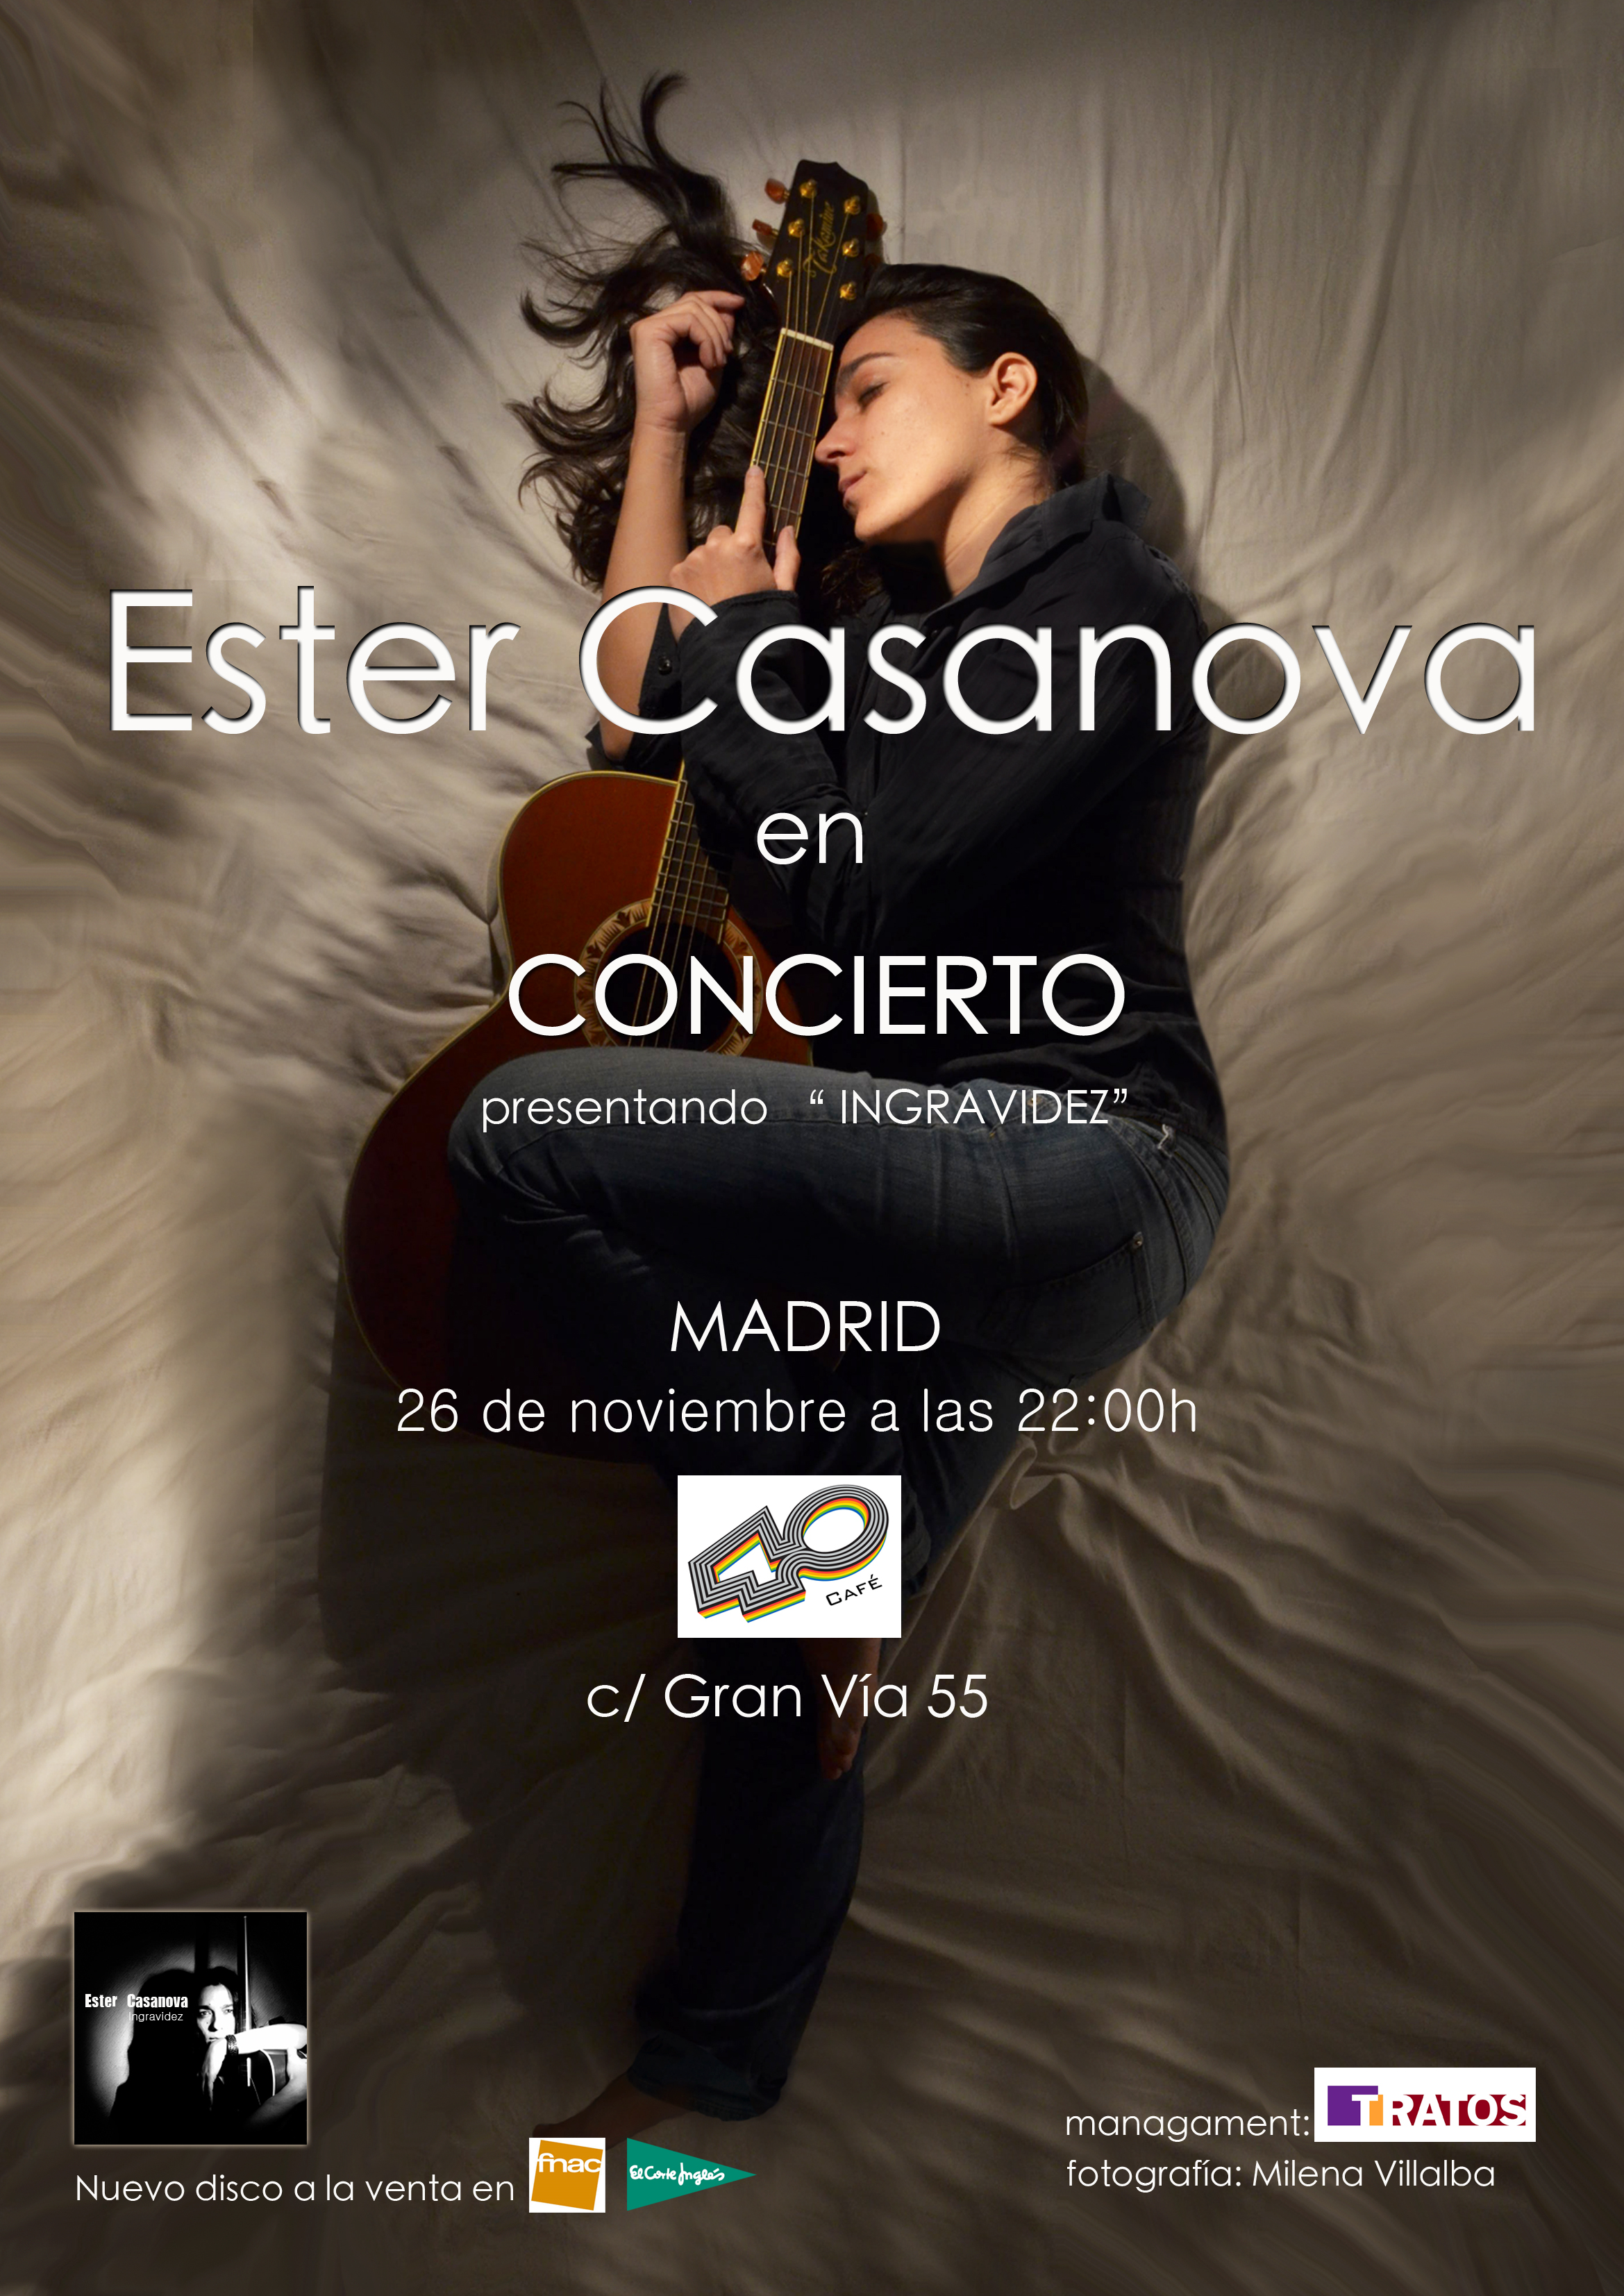 ESTER CASANOVA CARTEL 40CAFE